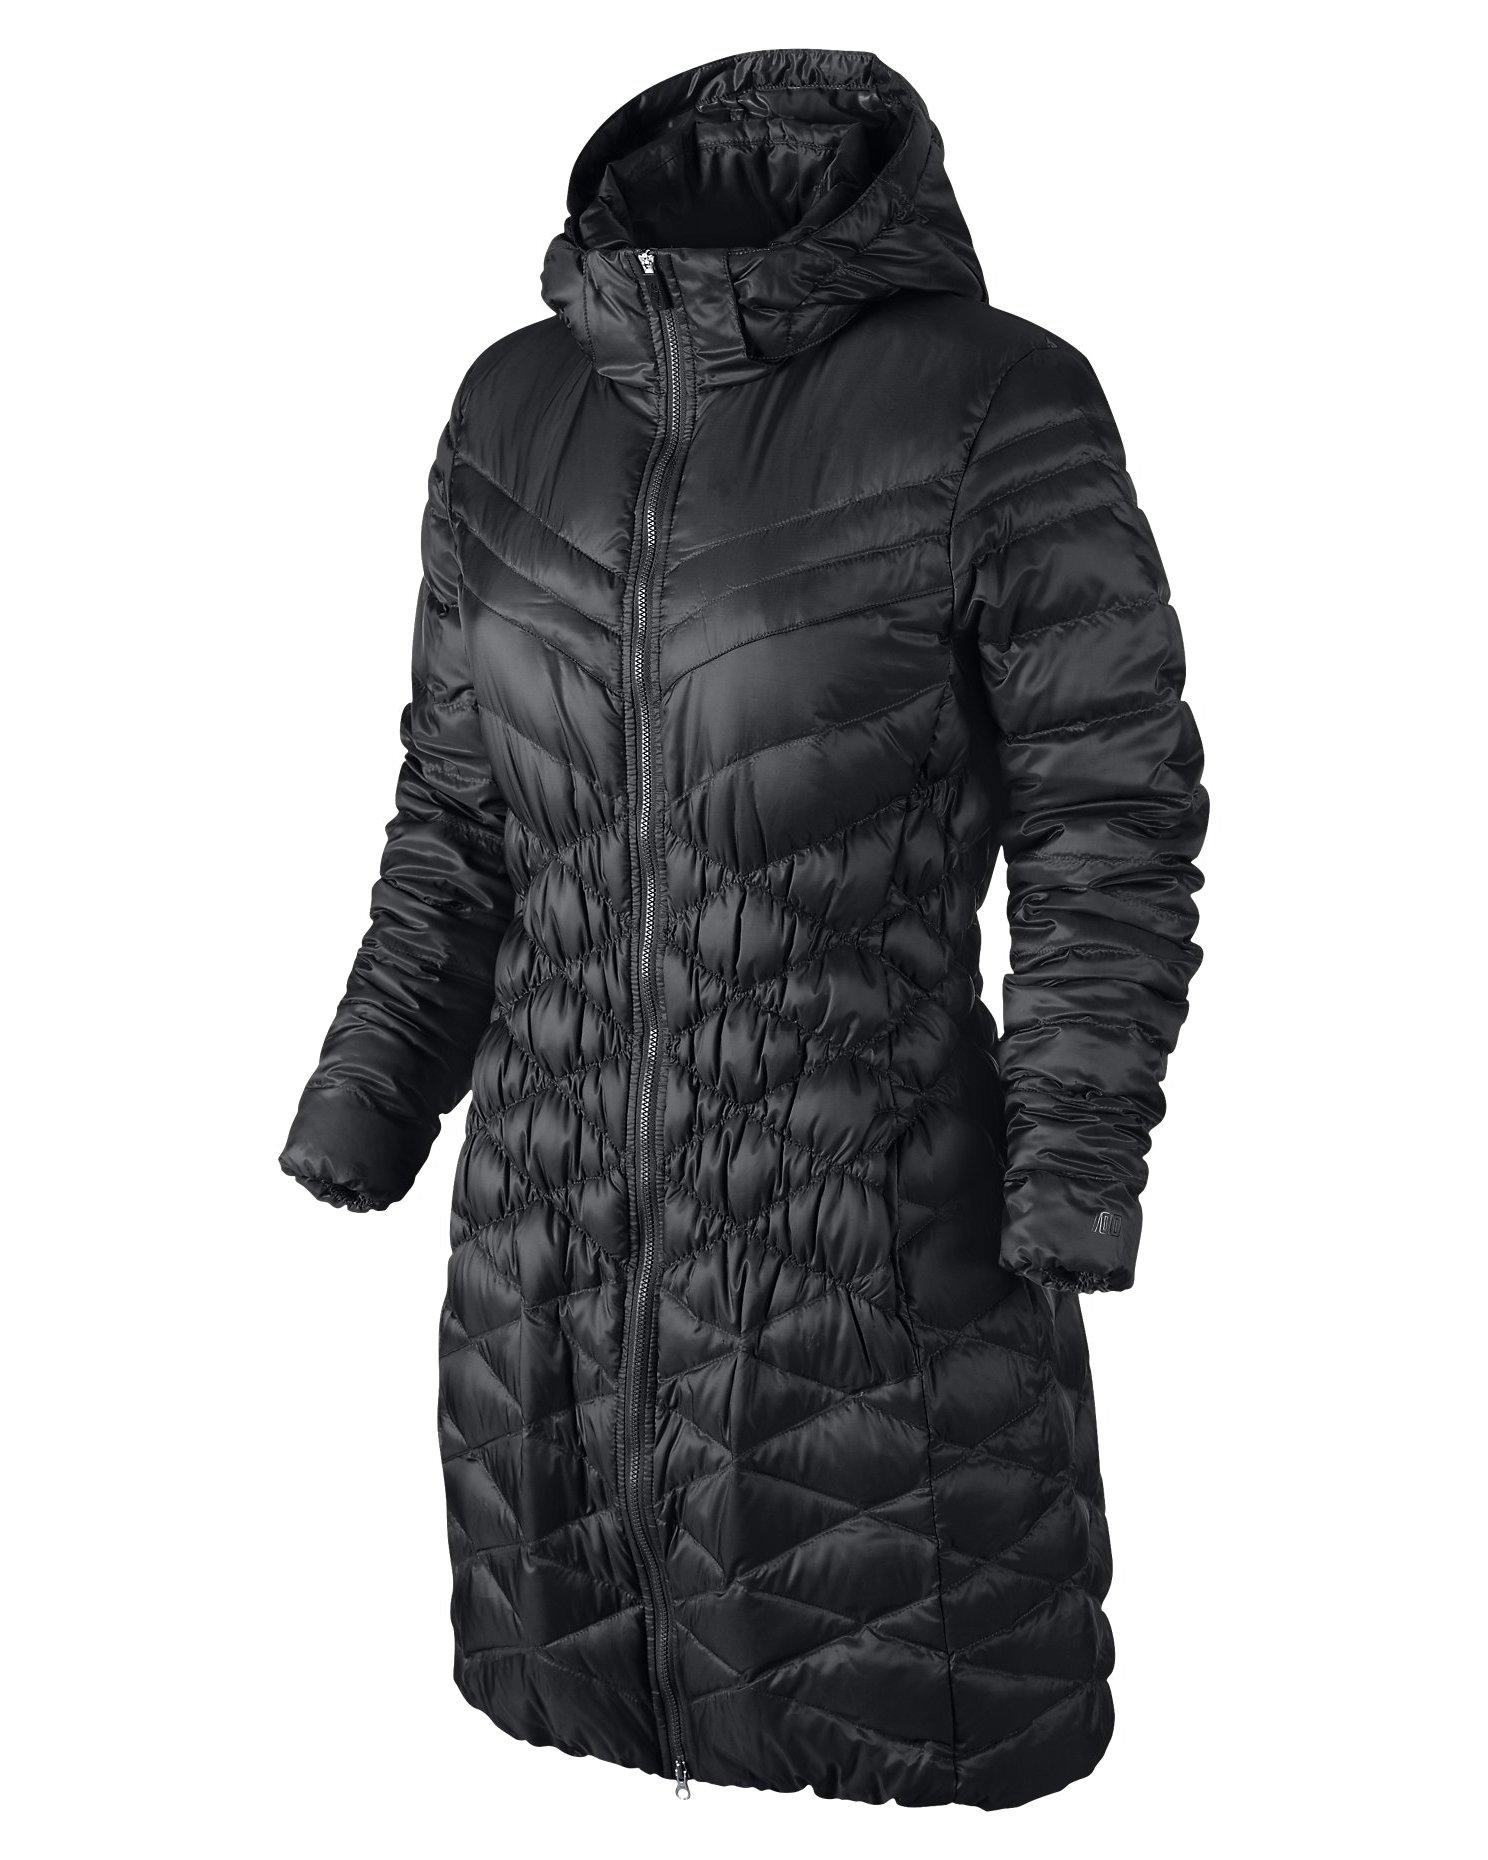 Nike Cascade Hooded Down Parka Womens Coat, Black, Small